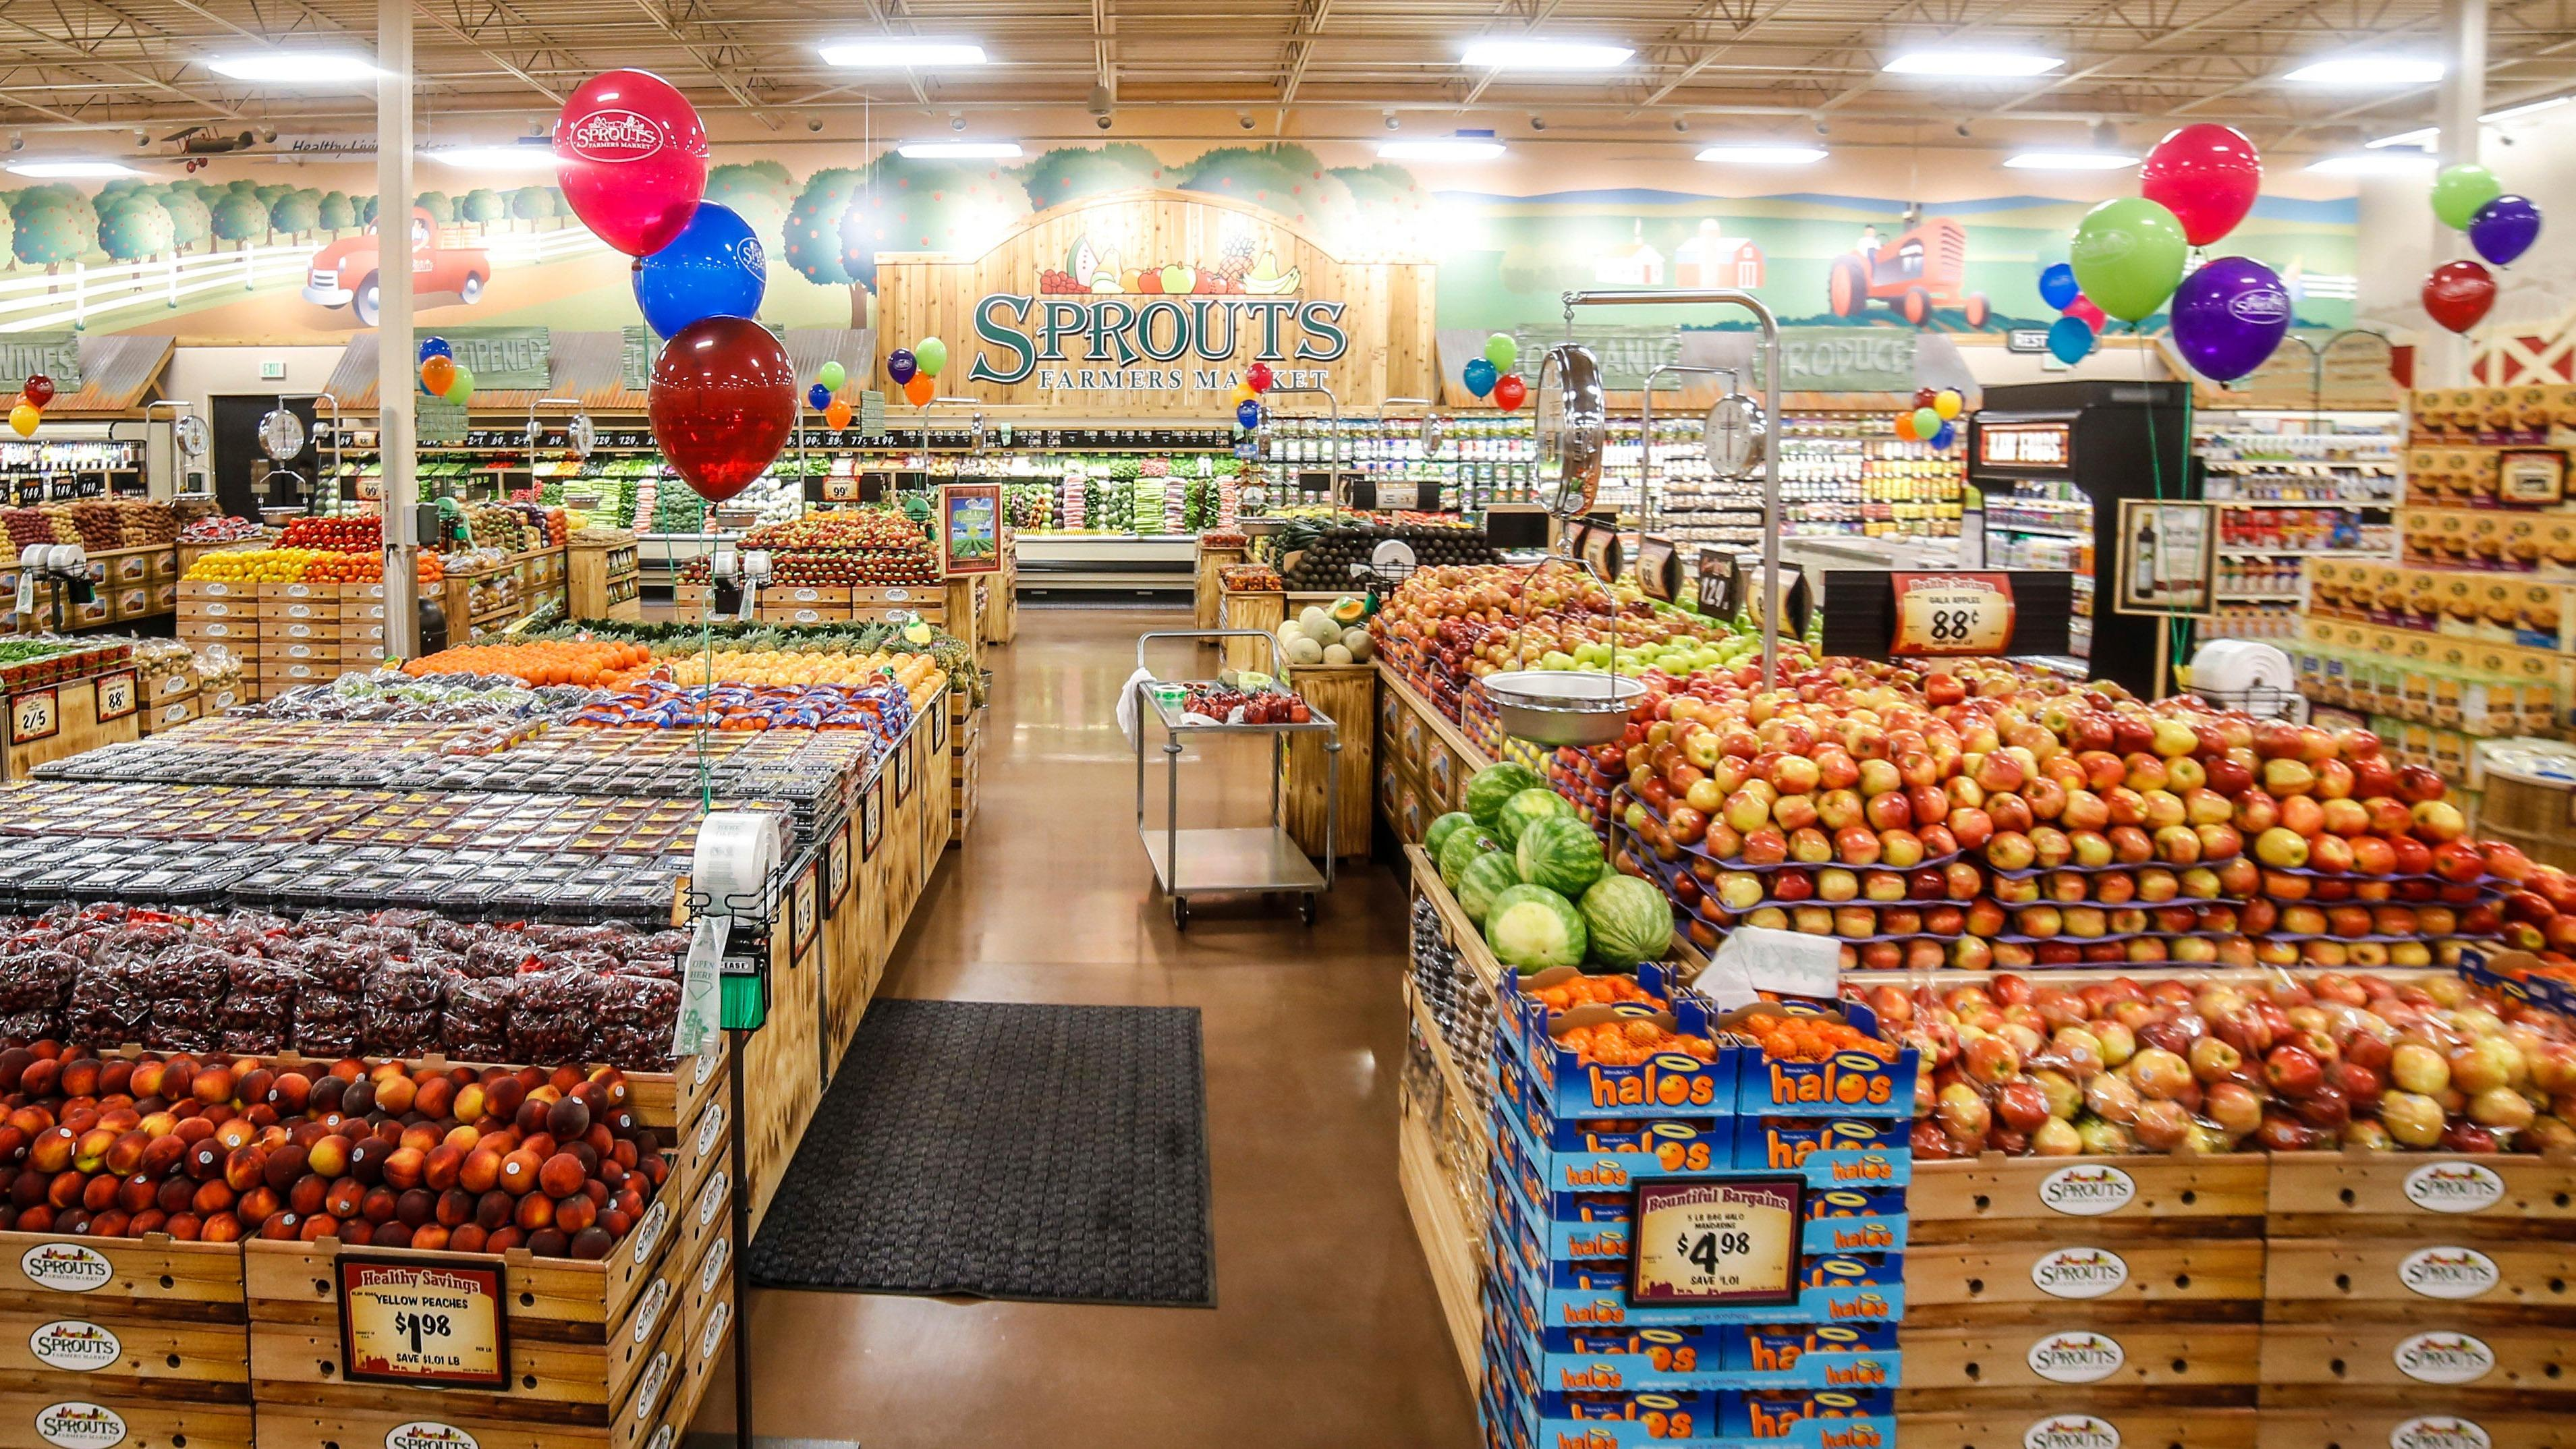 Sprouts Farmers Market 5130 W Peoria Ave, Glendale, AZ 85302